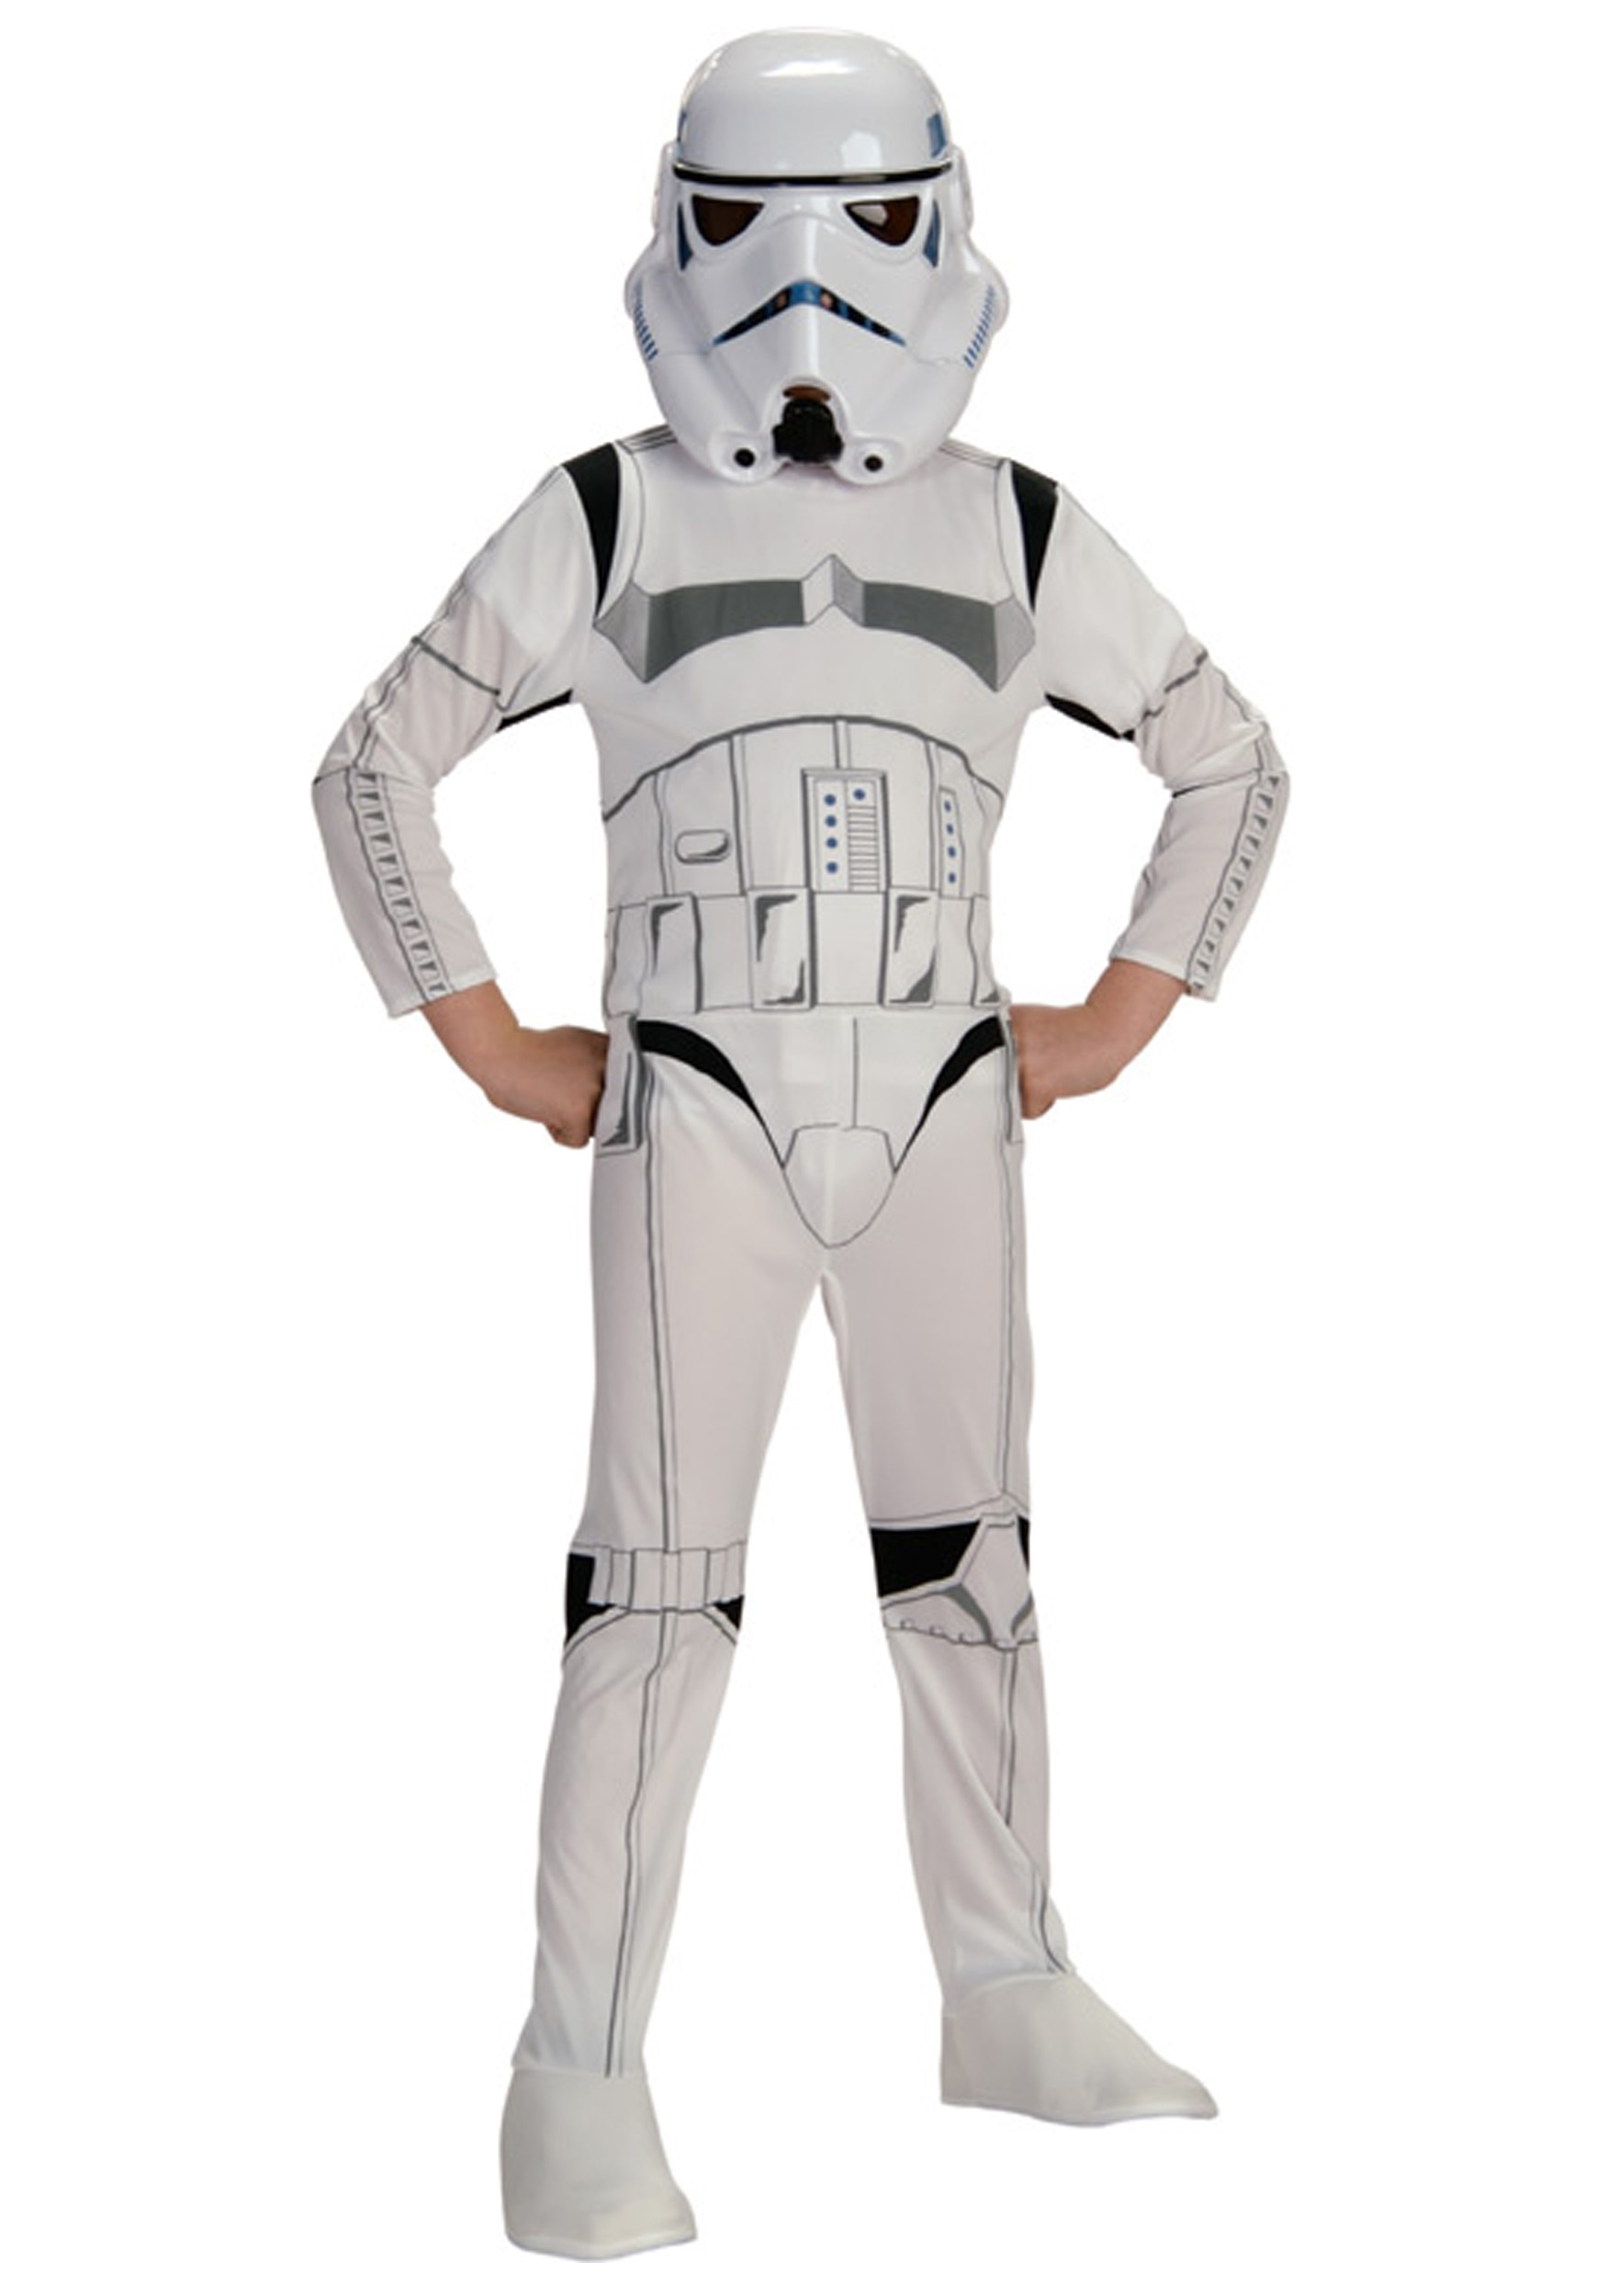 sc 1 st  Fun.com & Child Stormtrooper Costume